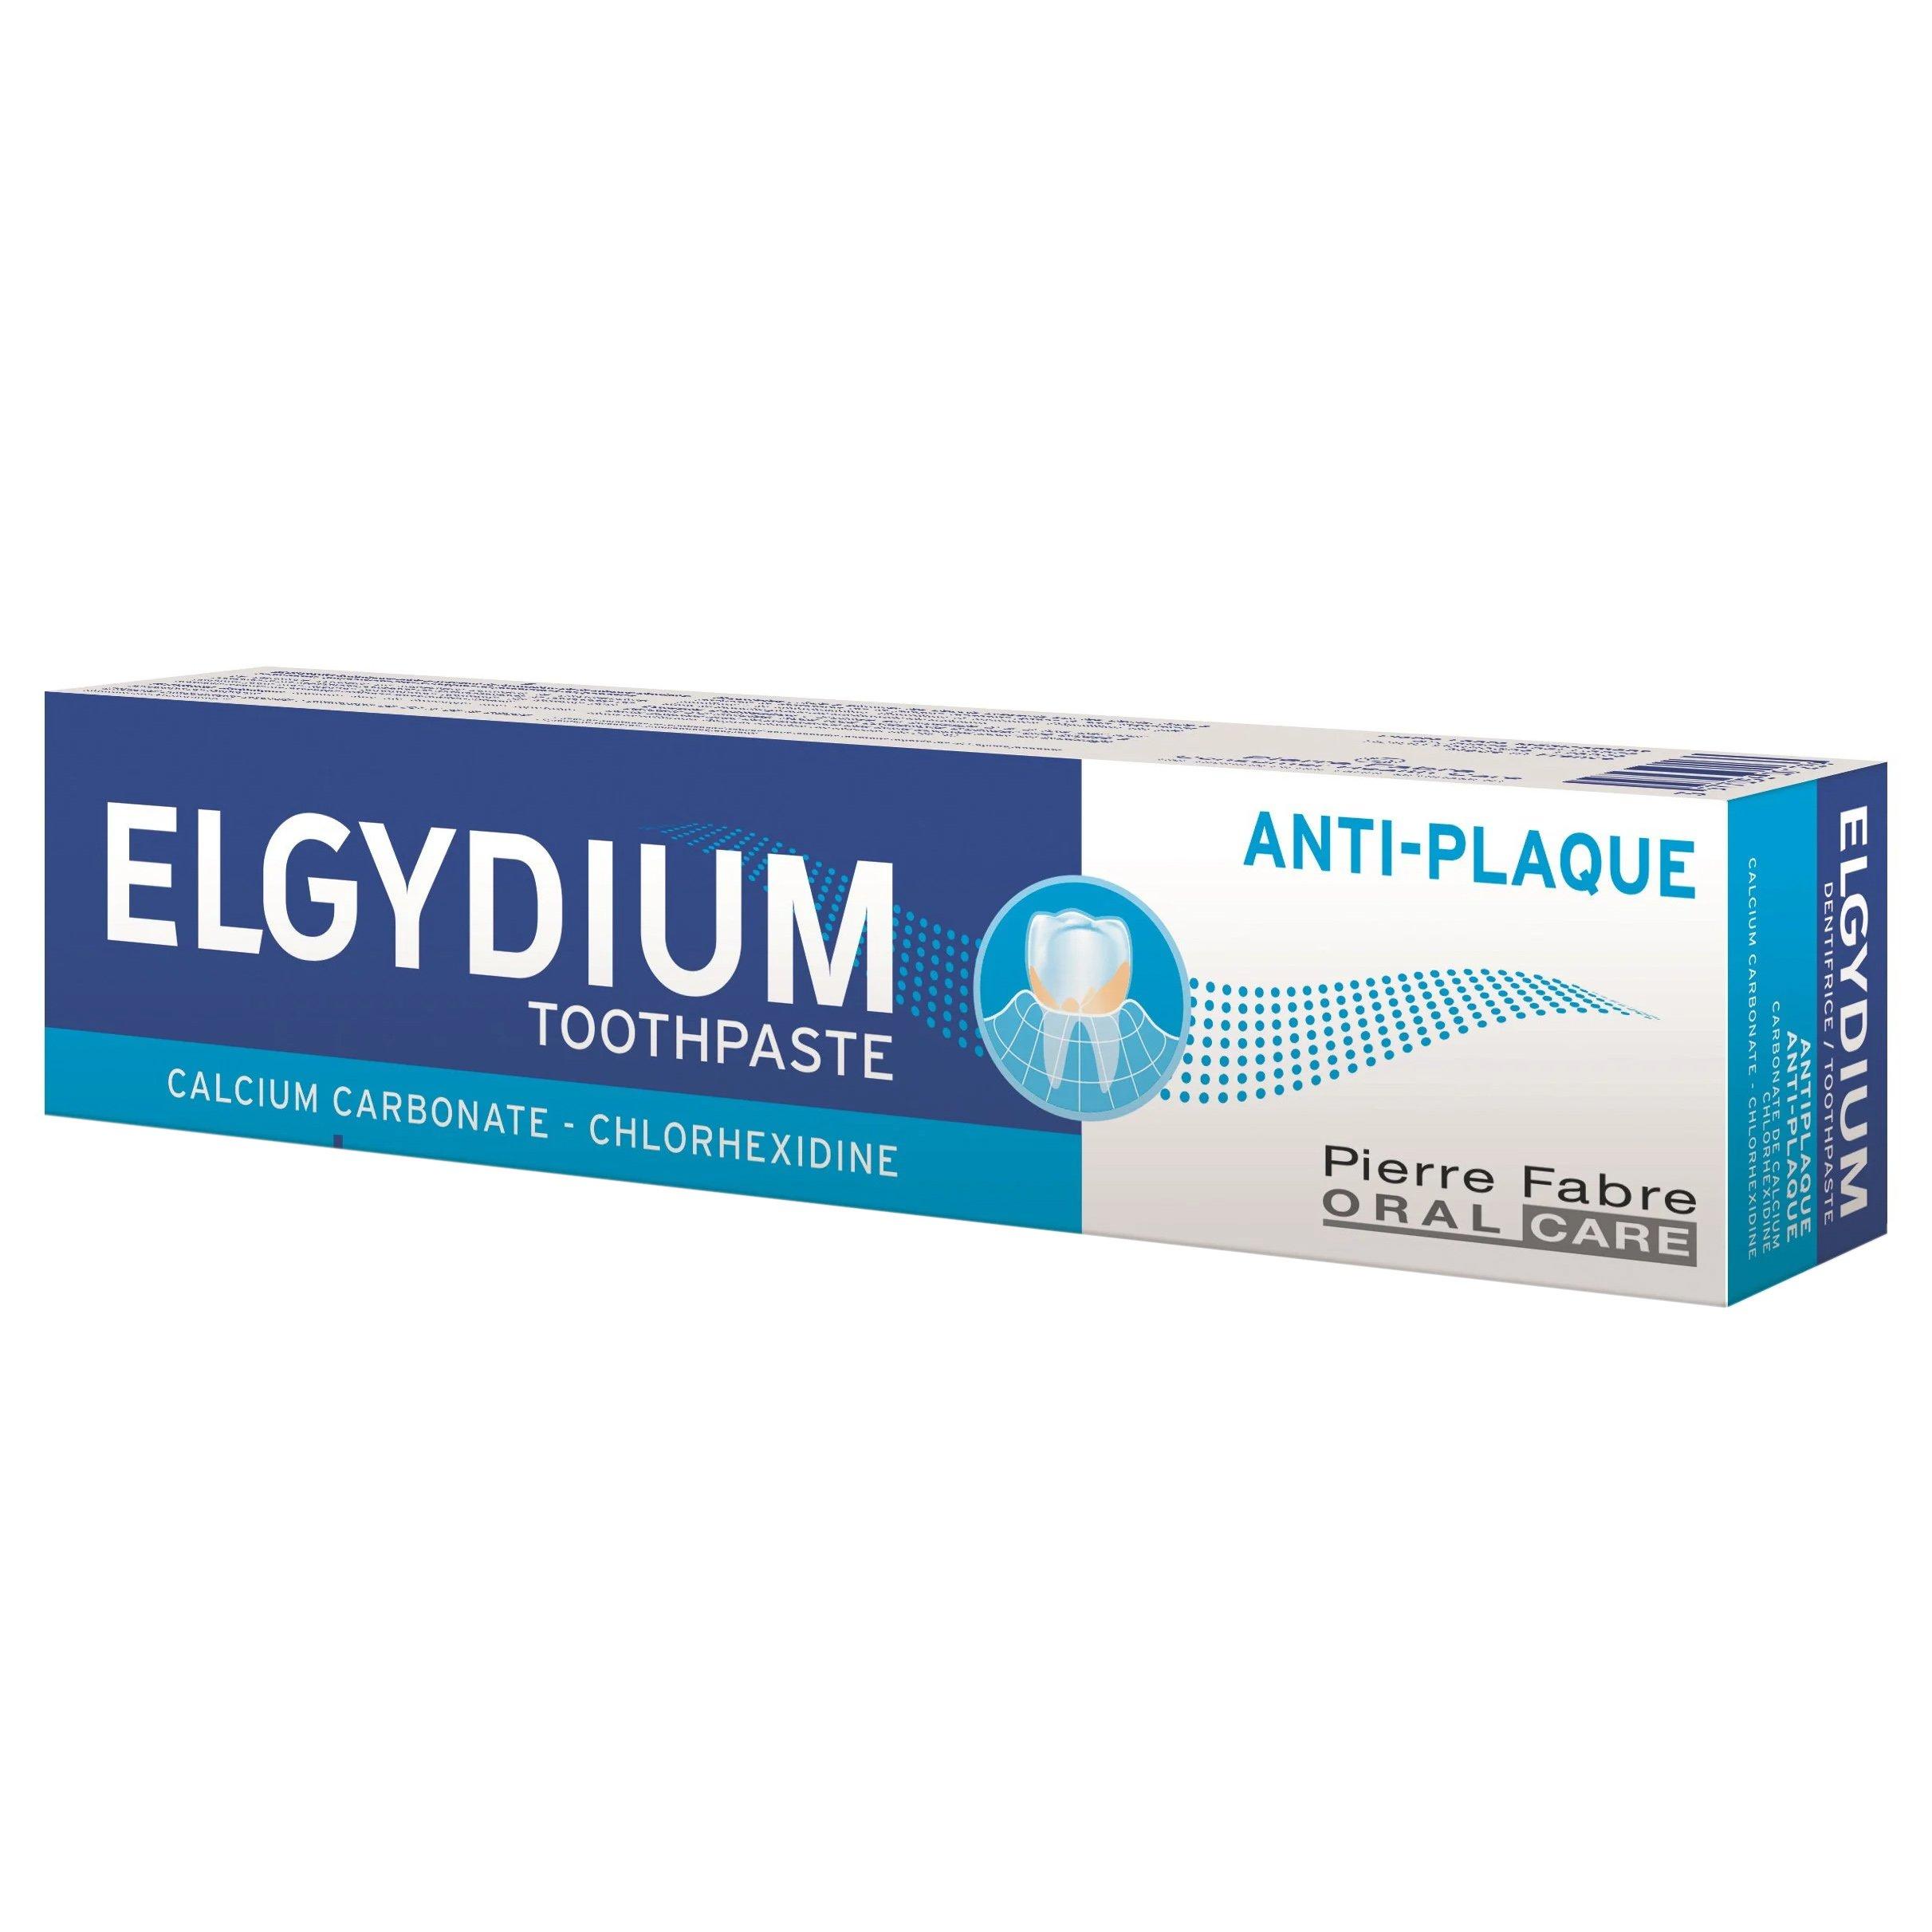 Elgydium Antiplaque Οδοντόκρεμα Κατά της Πλάκας 100ml